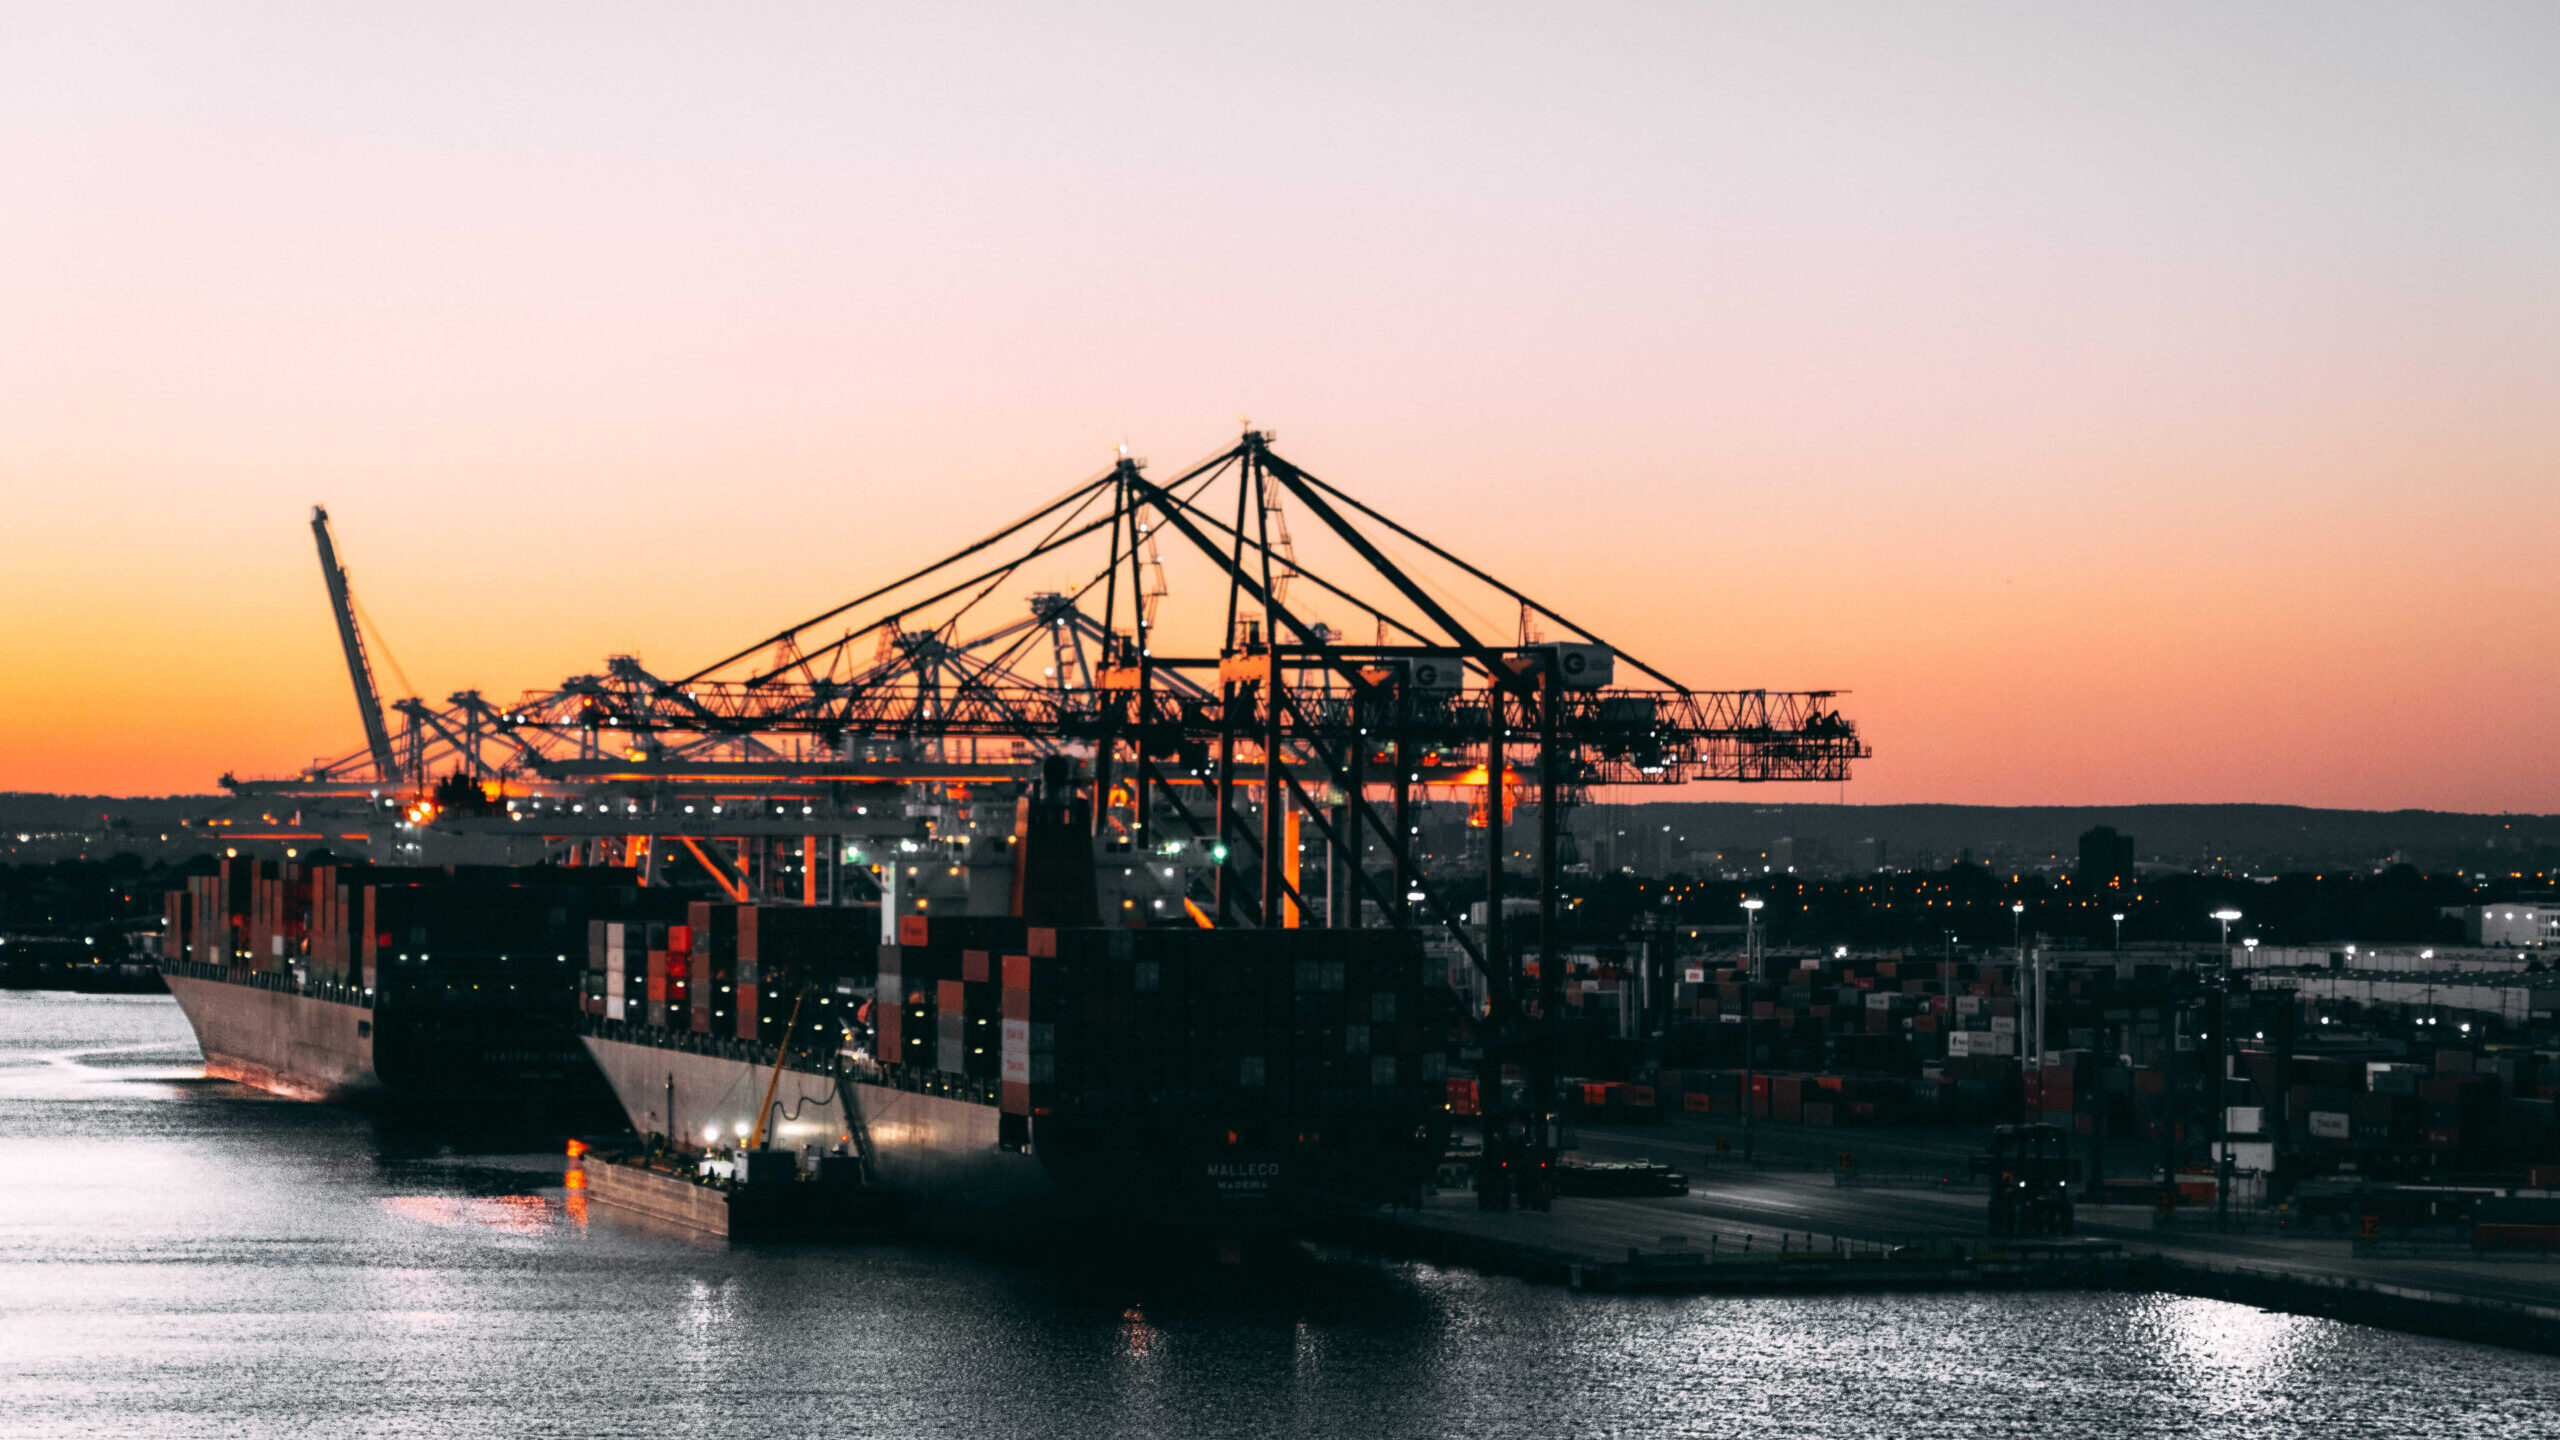 port-with-cranes-2326876 (1) (1)